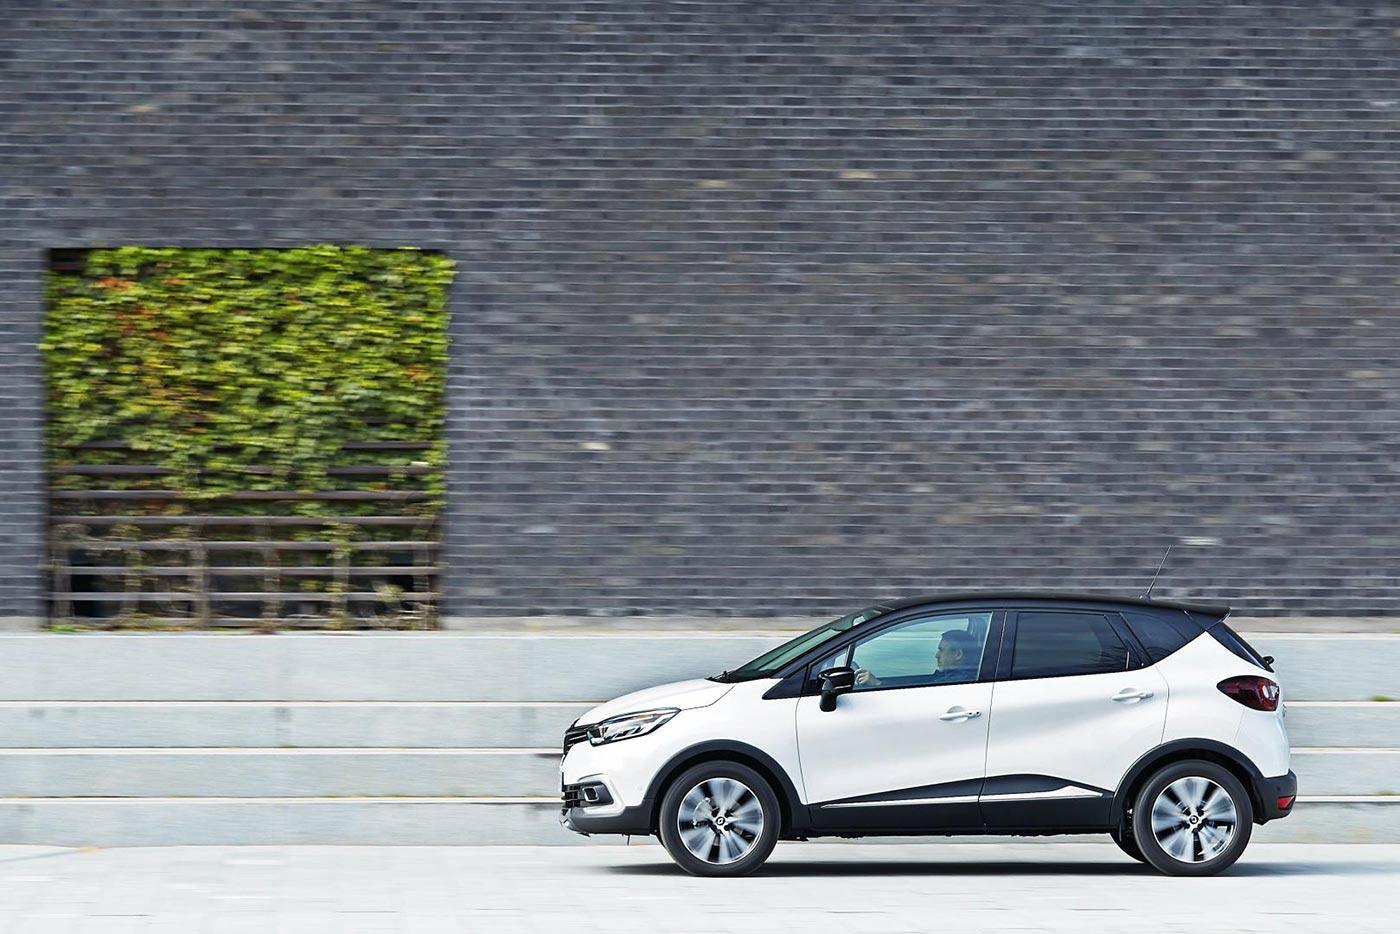 Zweifarb-Lackierung des Renault Capturs